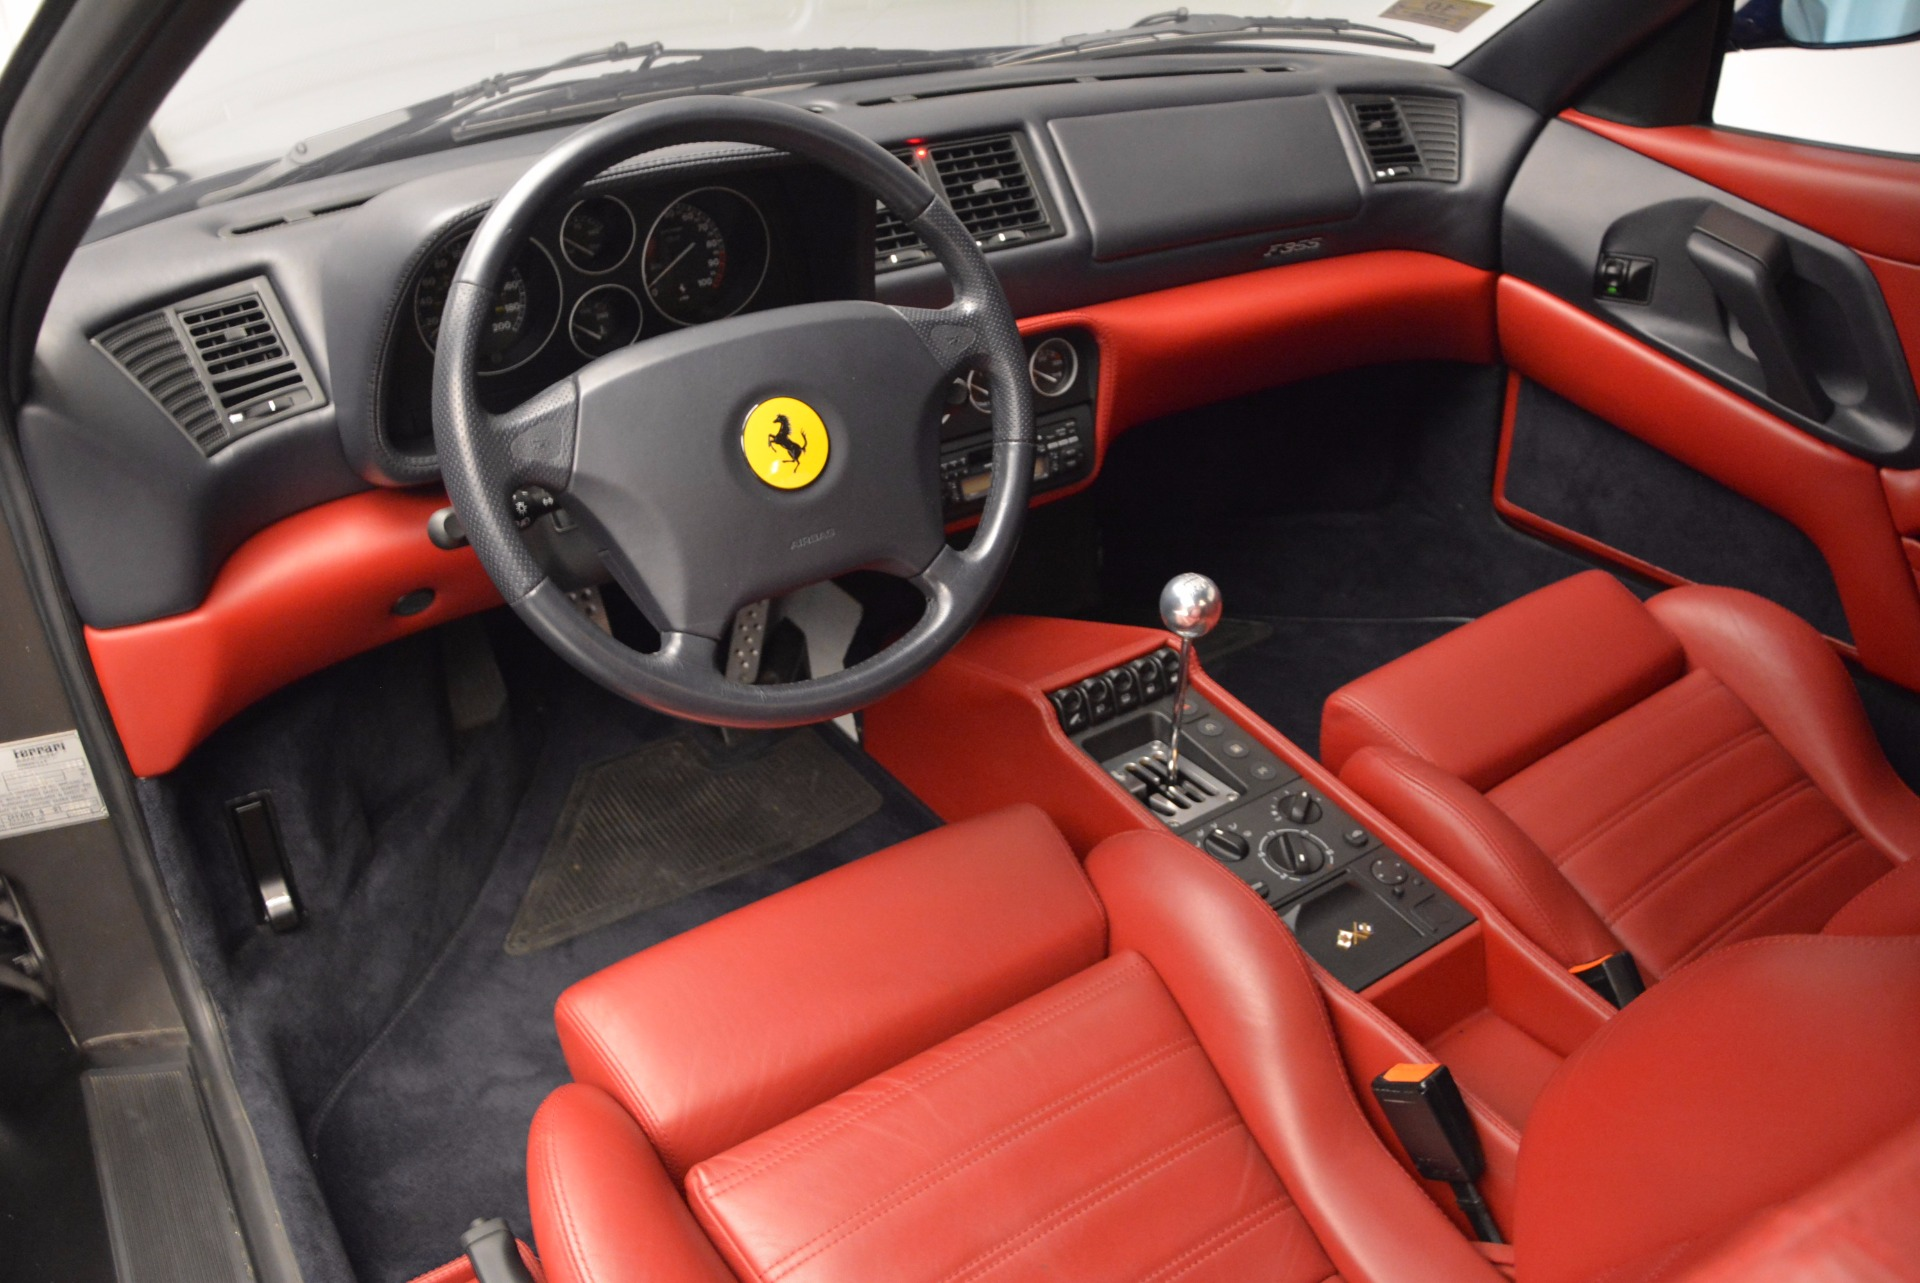 Used 1999 Ferrari 355 Berlinetta For Sale In Westport, CT 855_p14